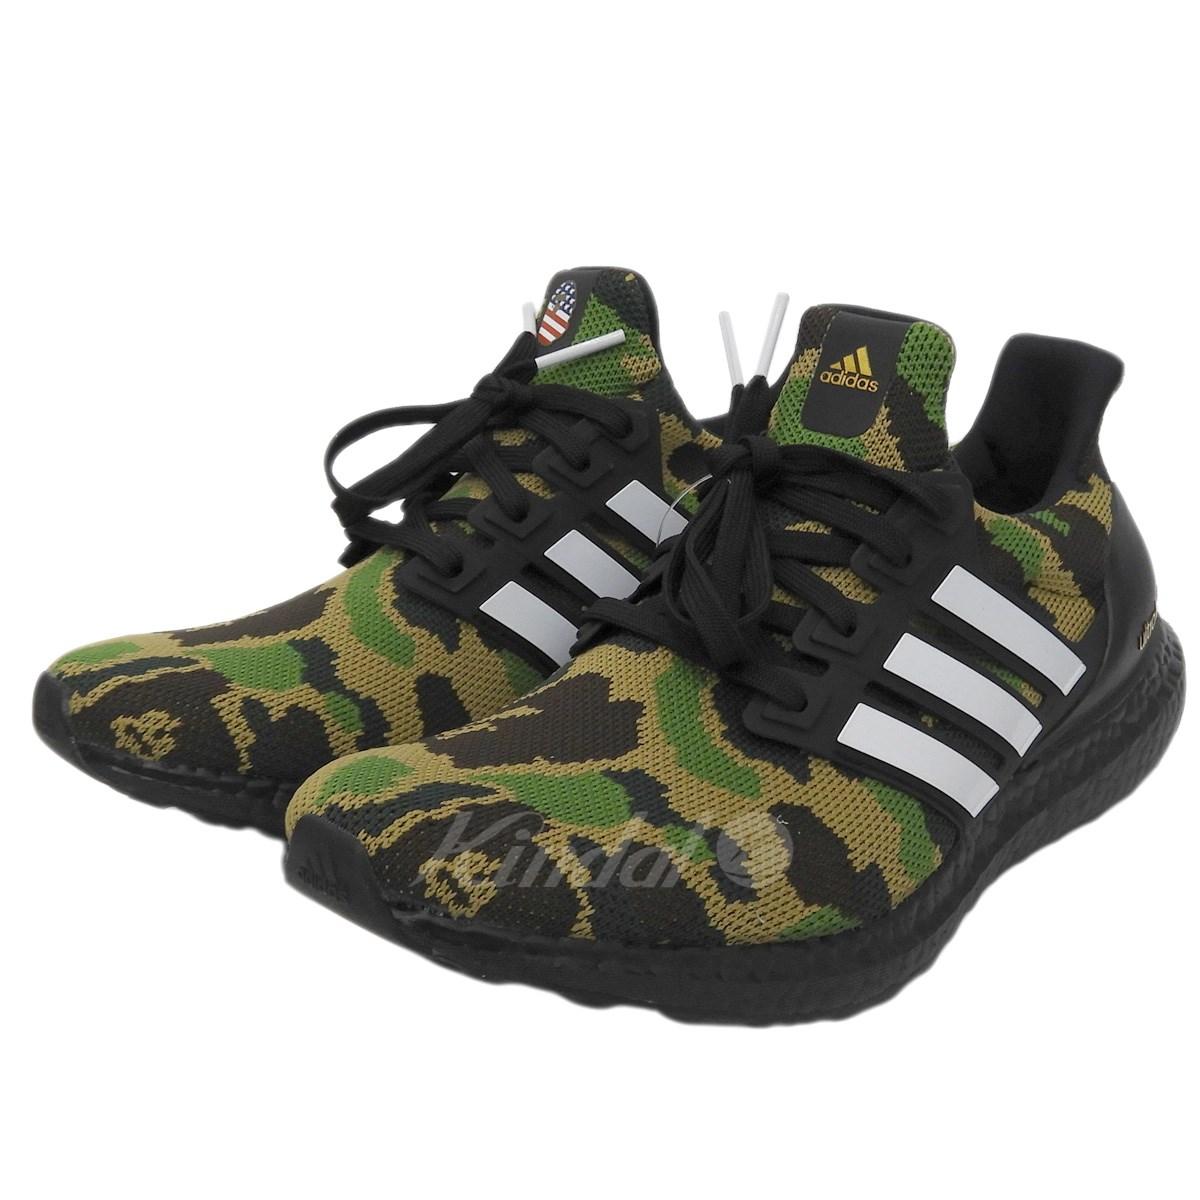 finest selection b5a00 05fe7 A BATHING APE X adidas